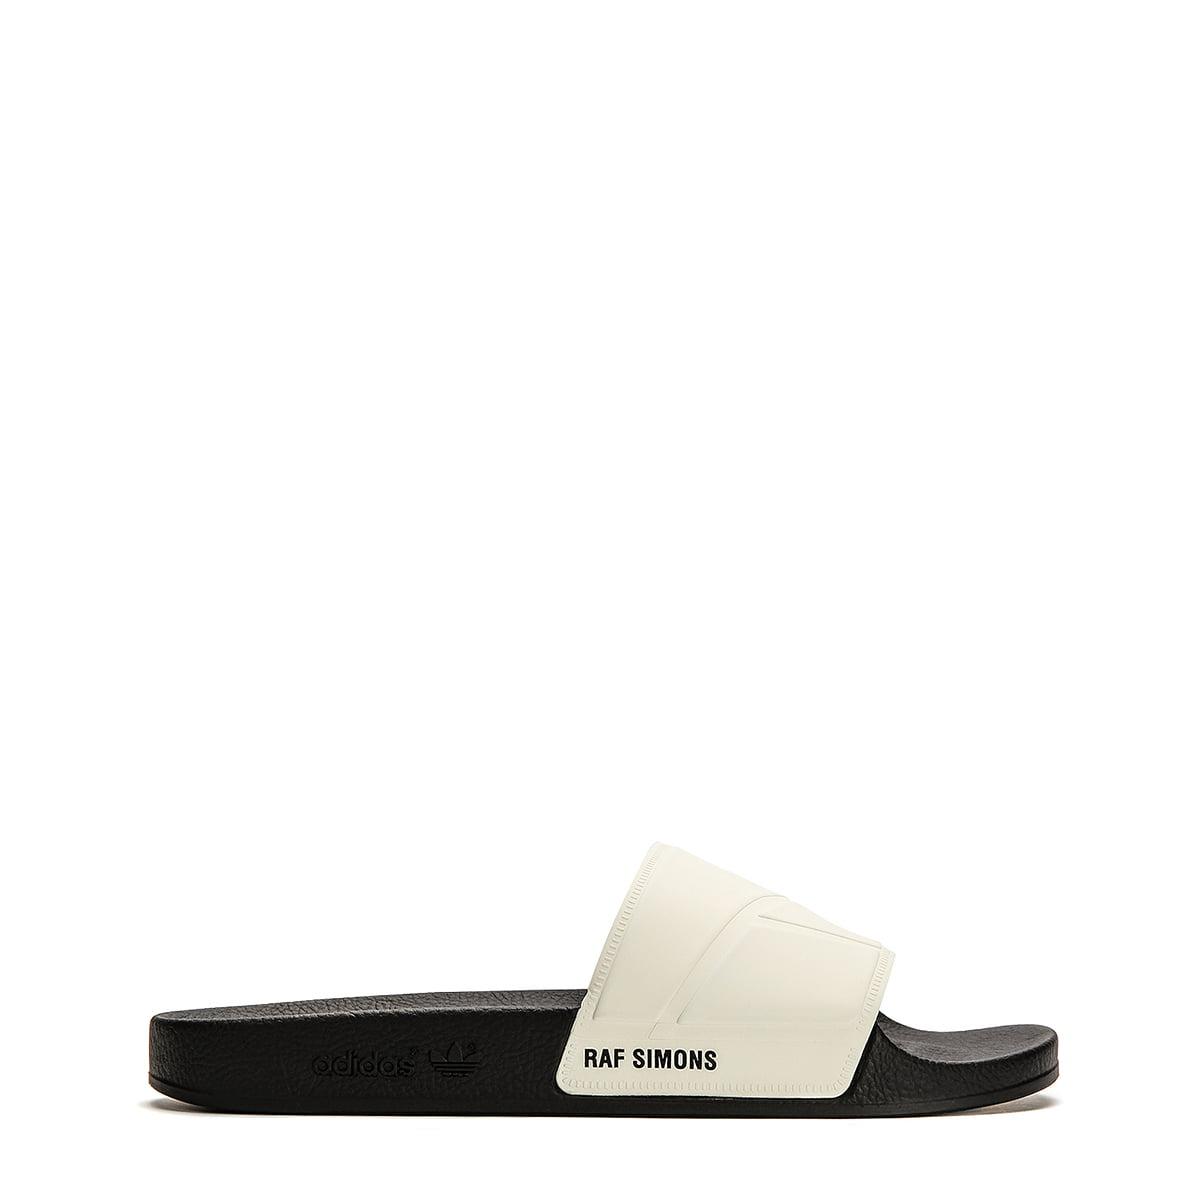 Adidas x Raf Simons Adilette Bunny Slide Sandals BY9814 C...